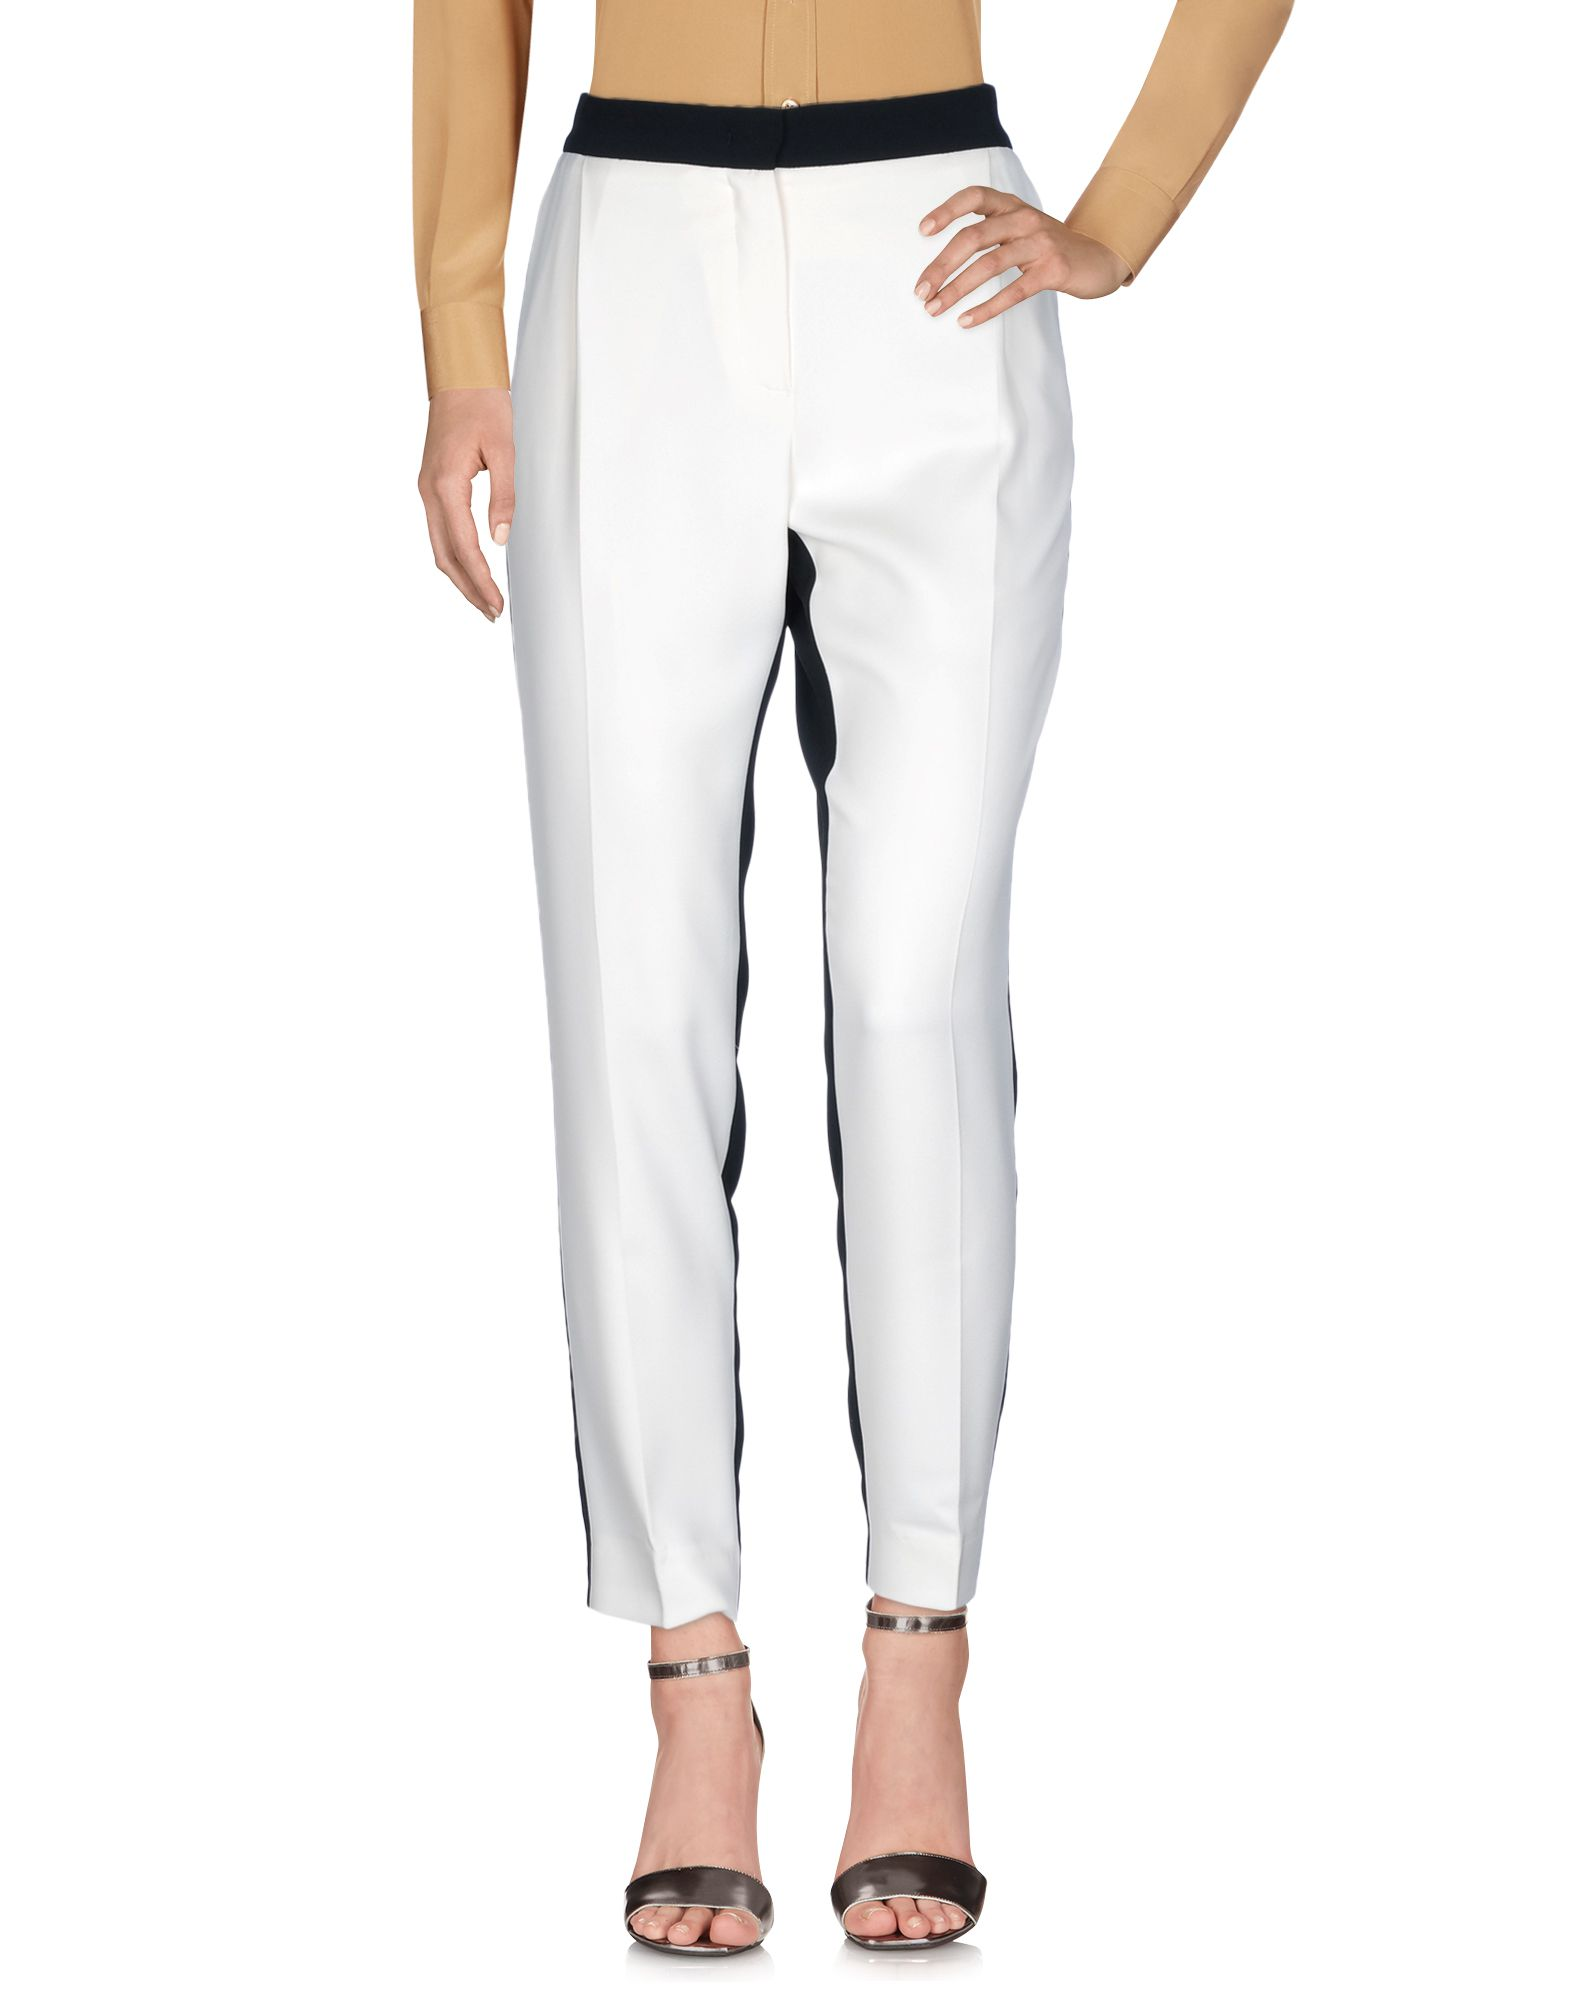 Pantalone Marella Donna - Acquista online su qqB1KNAf